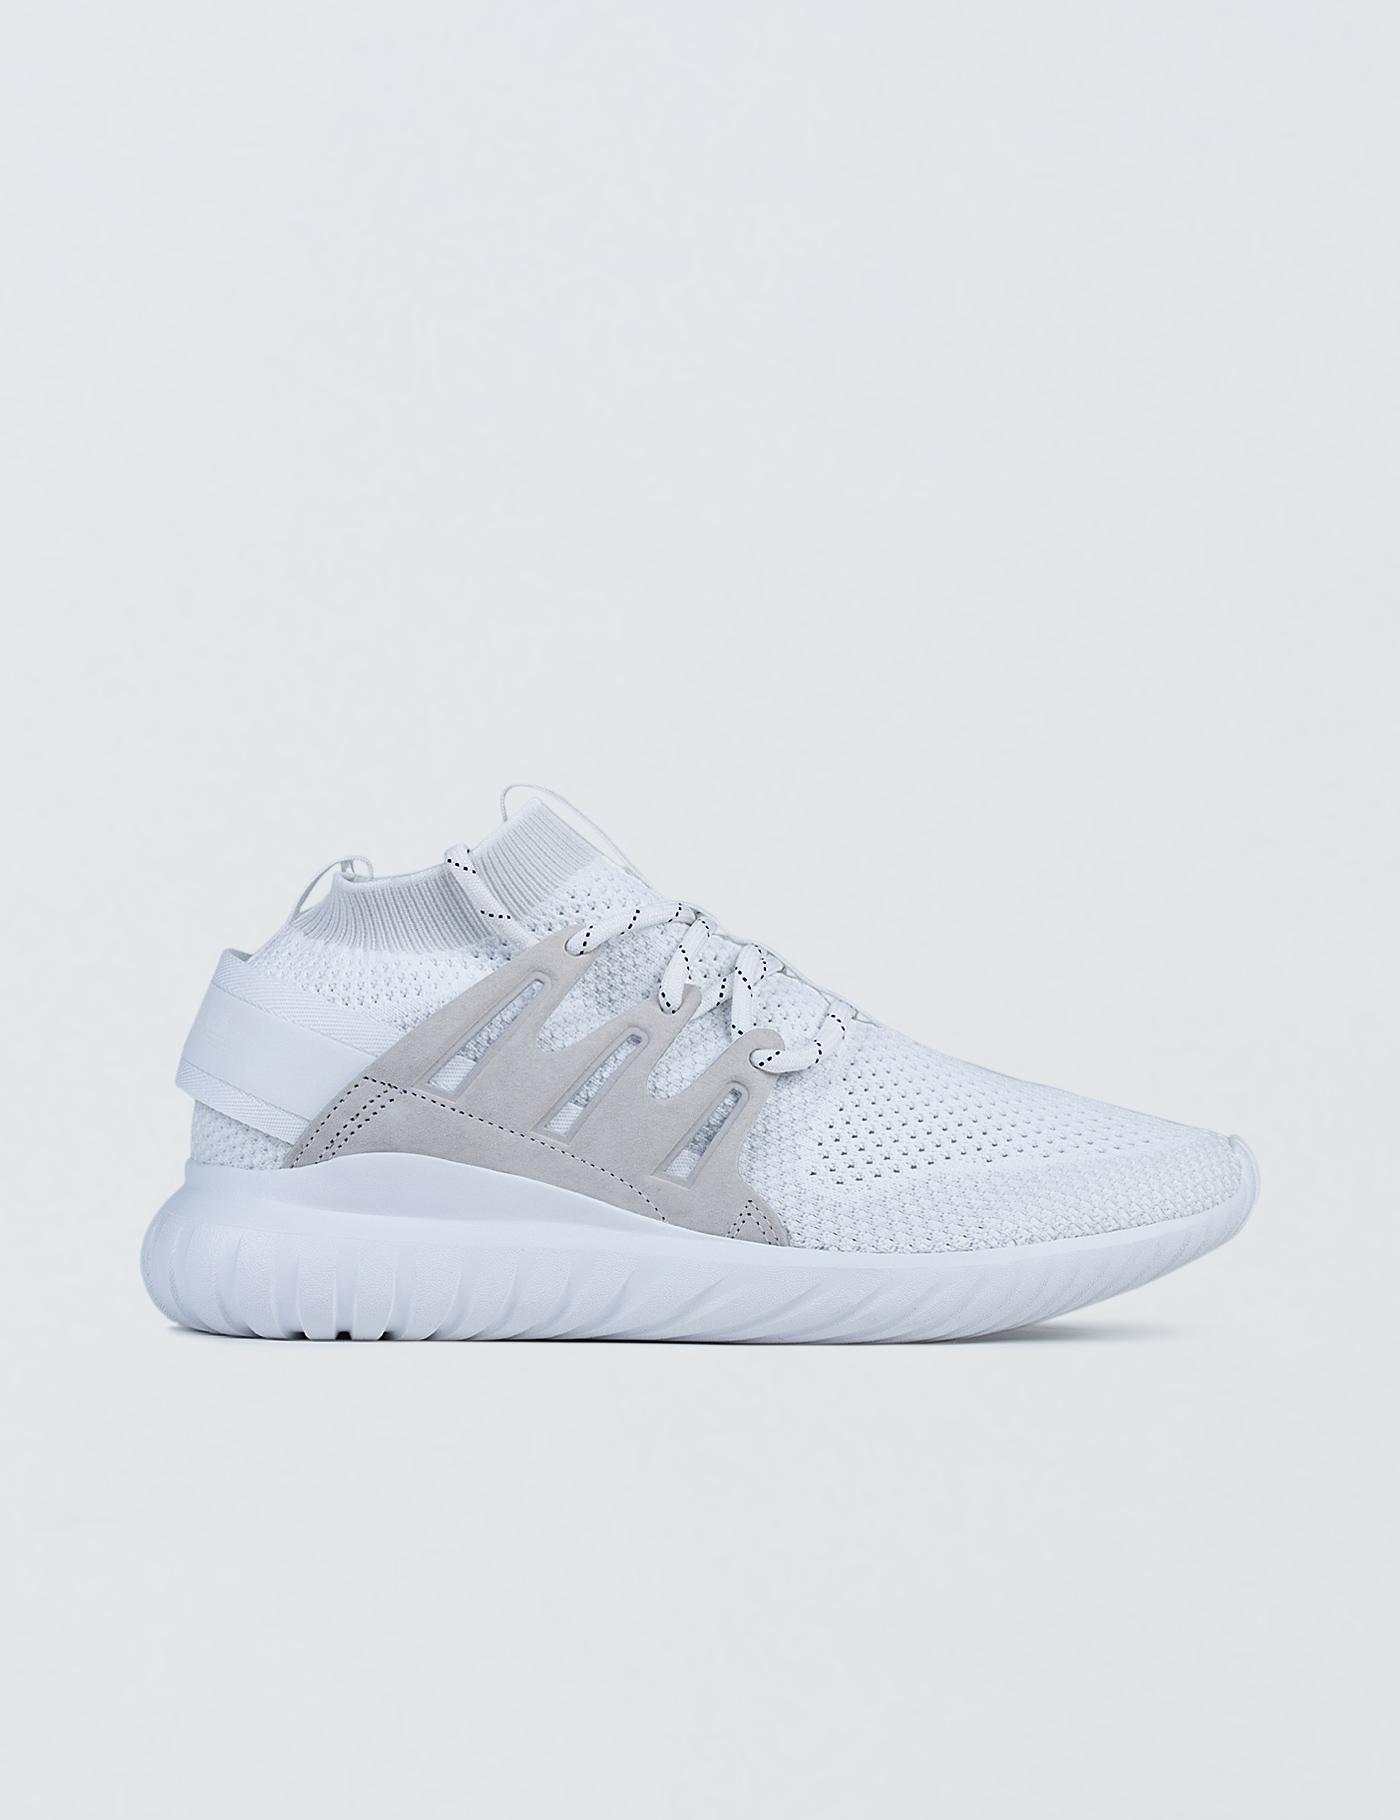 Adidas Originals Tubular Nova Primeknit